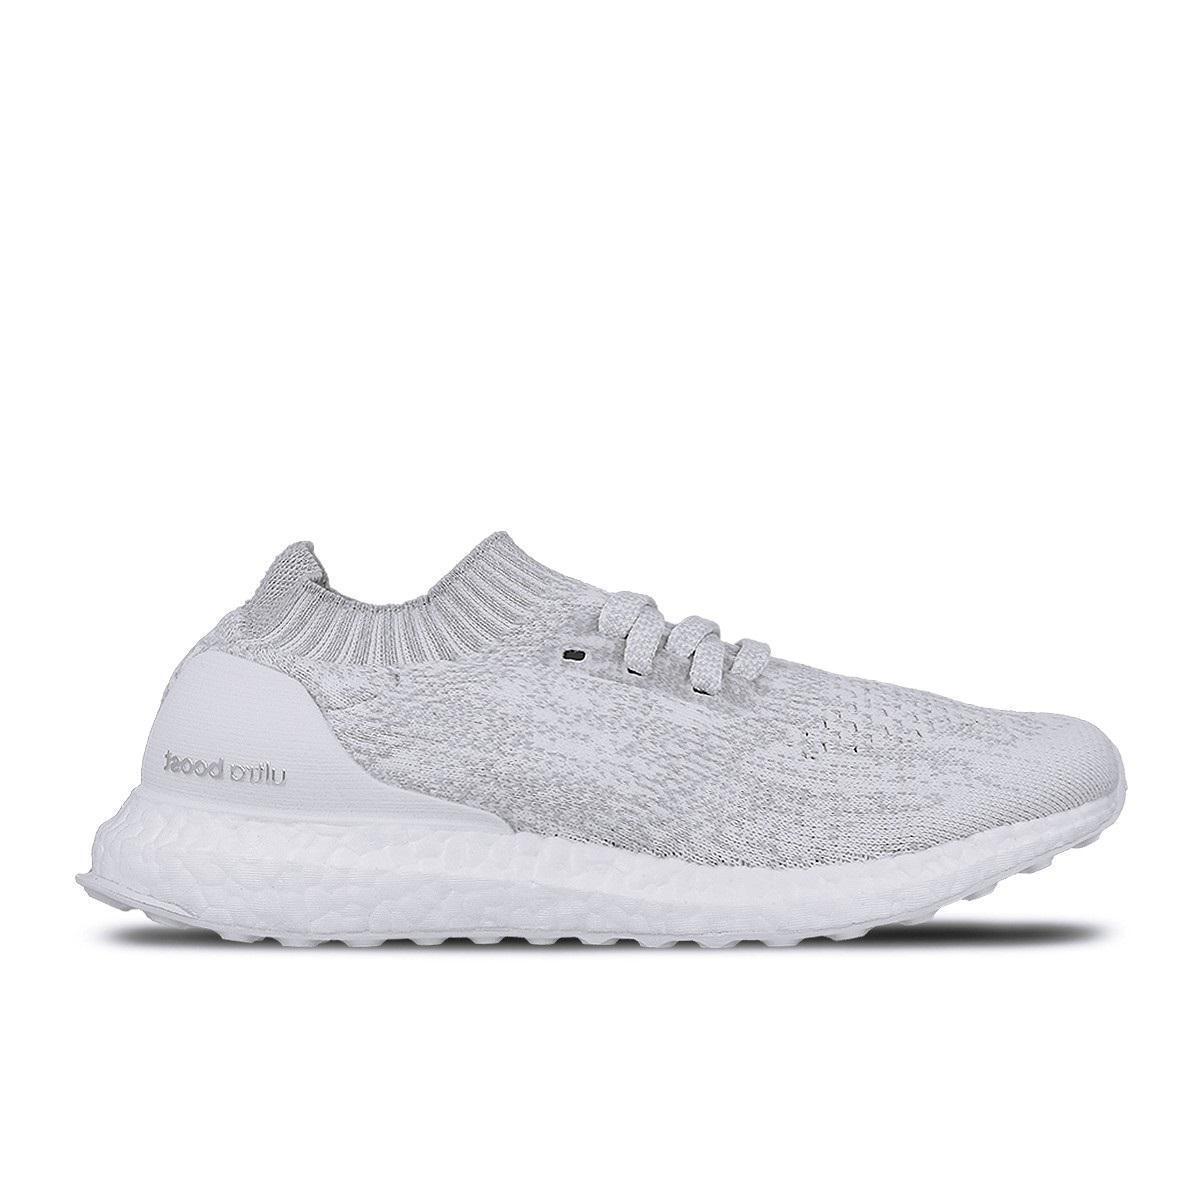 Señora adidas ultraboost uncaged W s80780  blanco o zapatillas s80780 W acede0